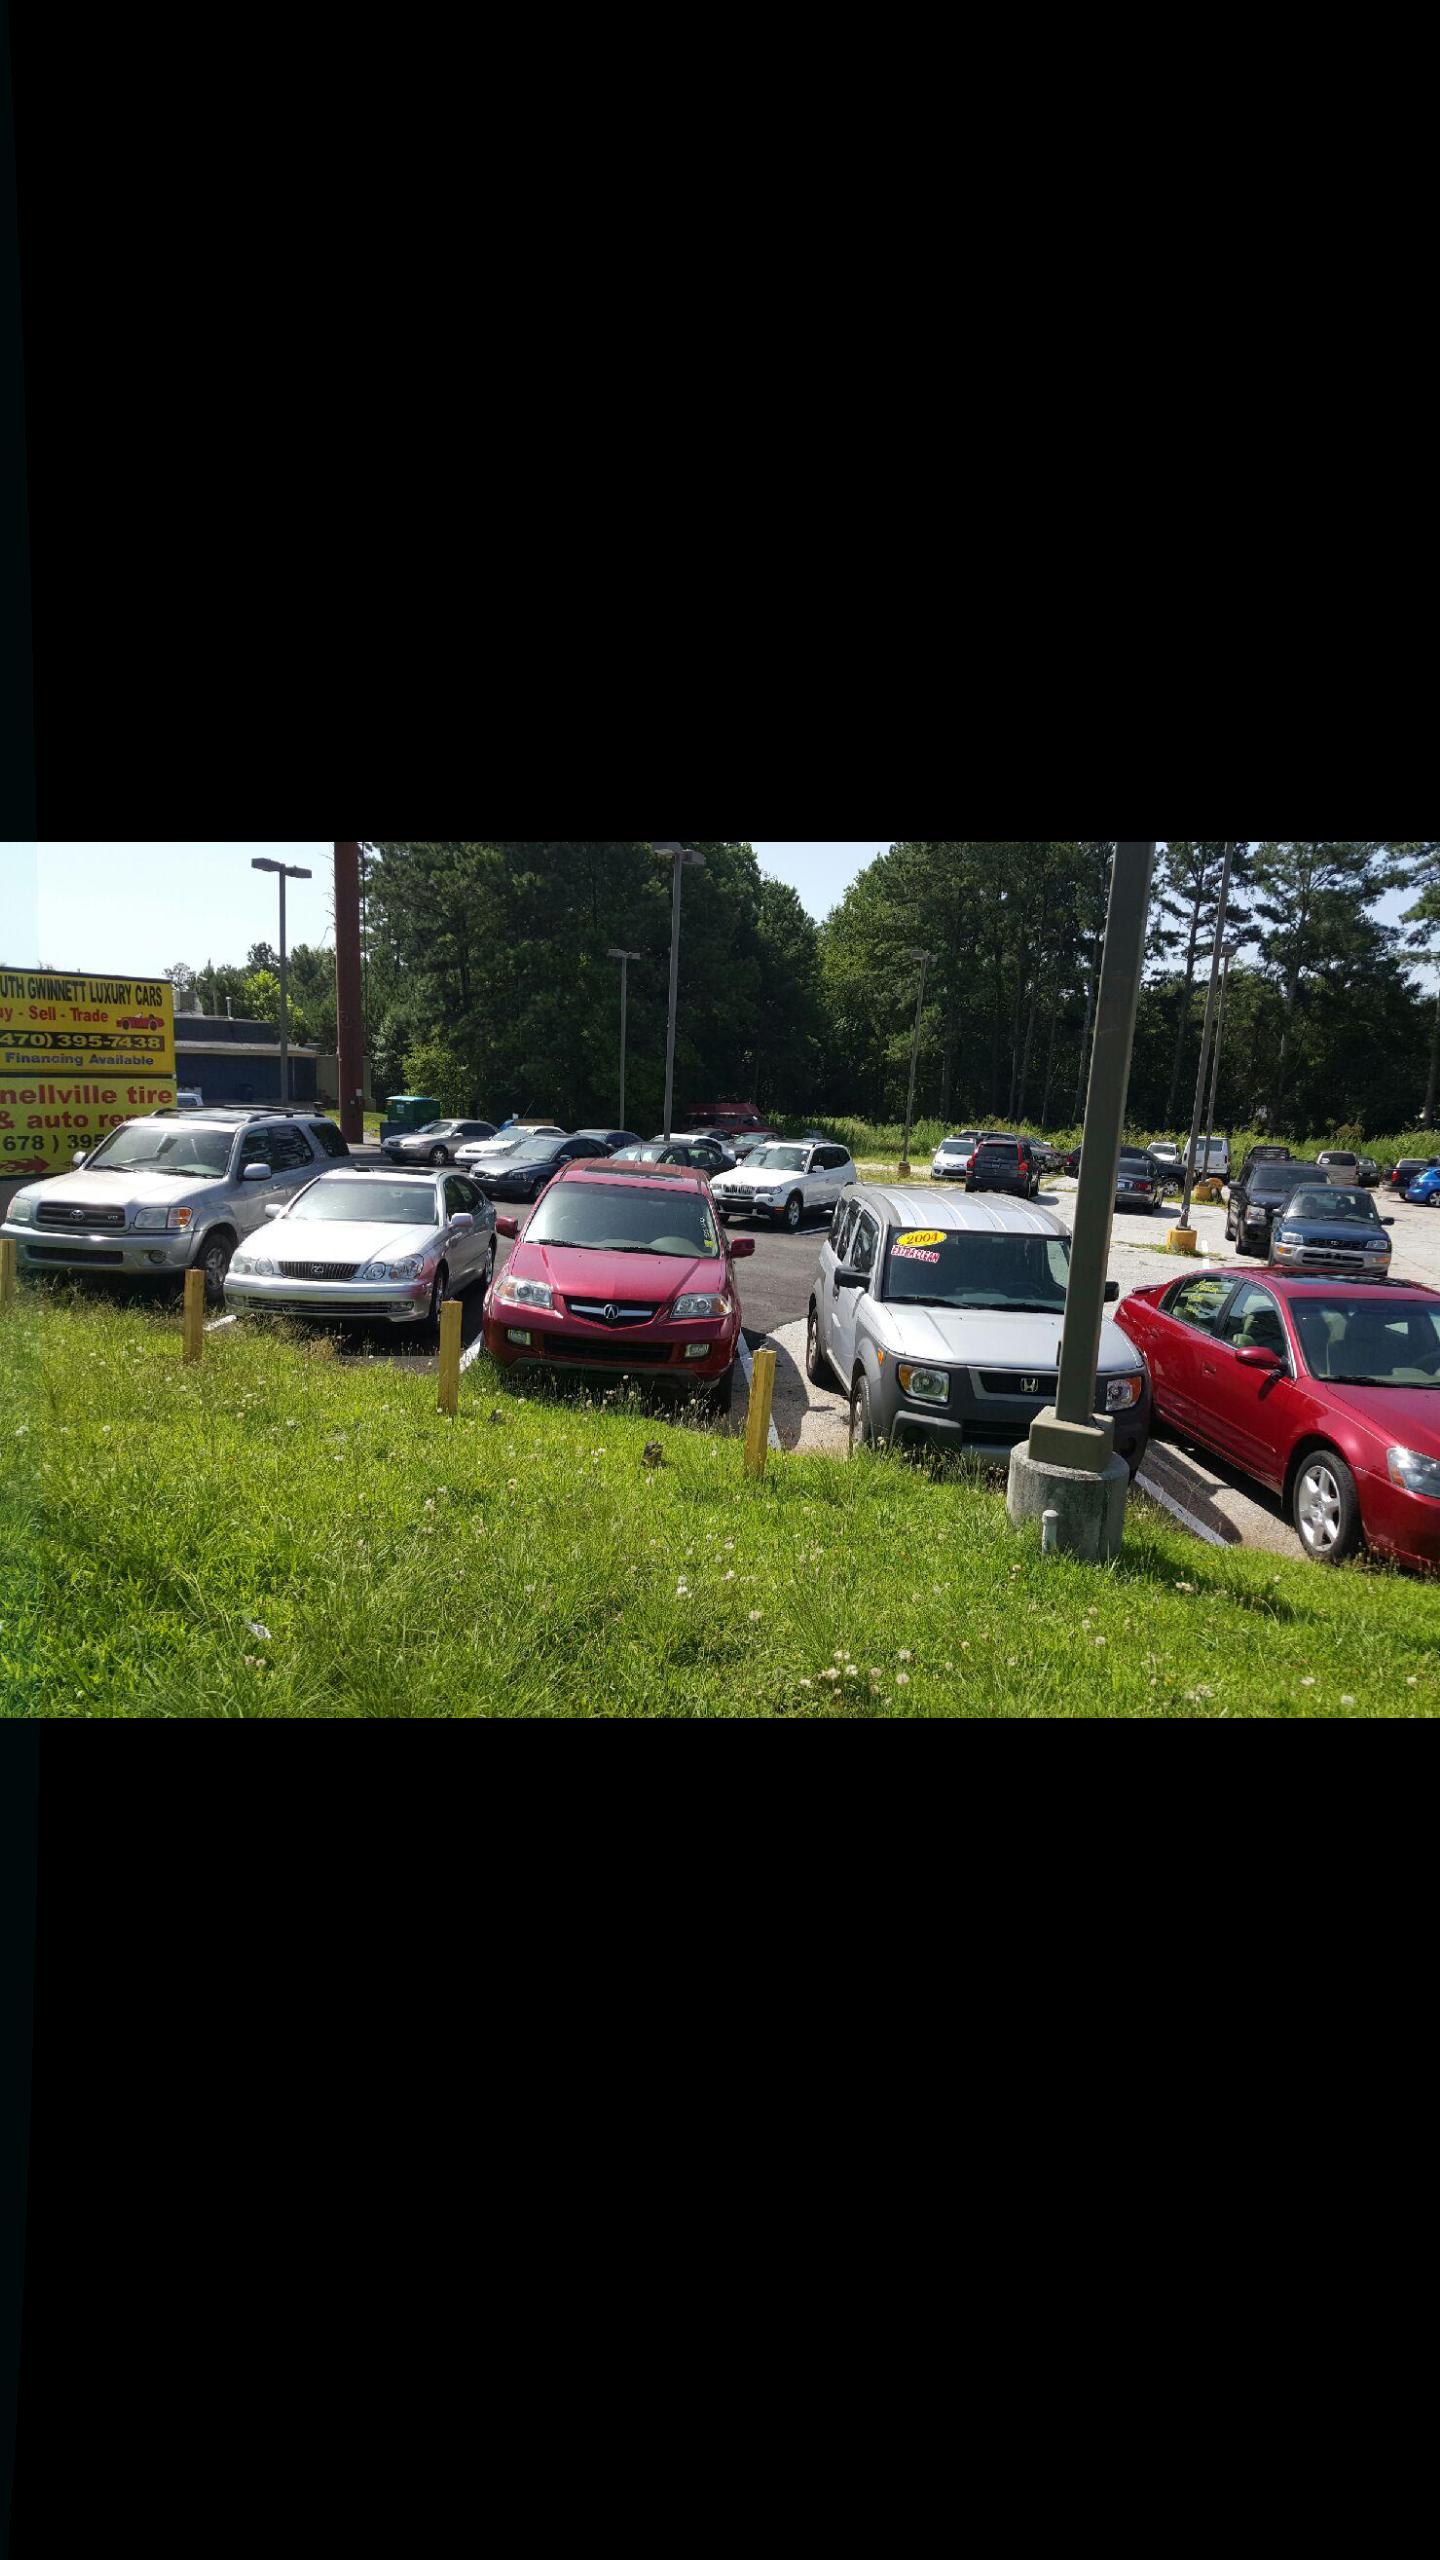 South Gwinnett Luxury Cars 2034 Main St E Snellville GA YP